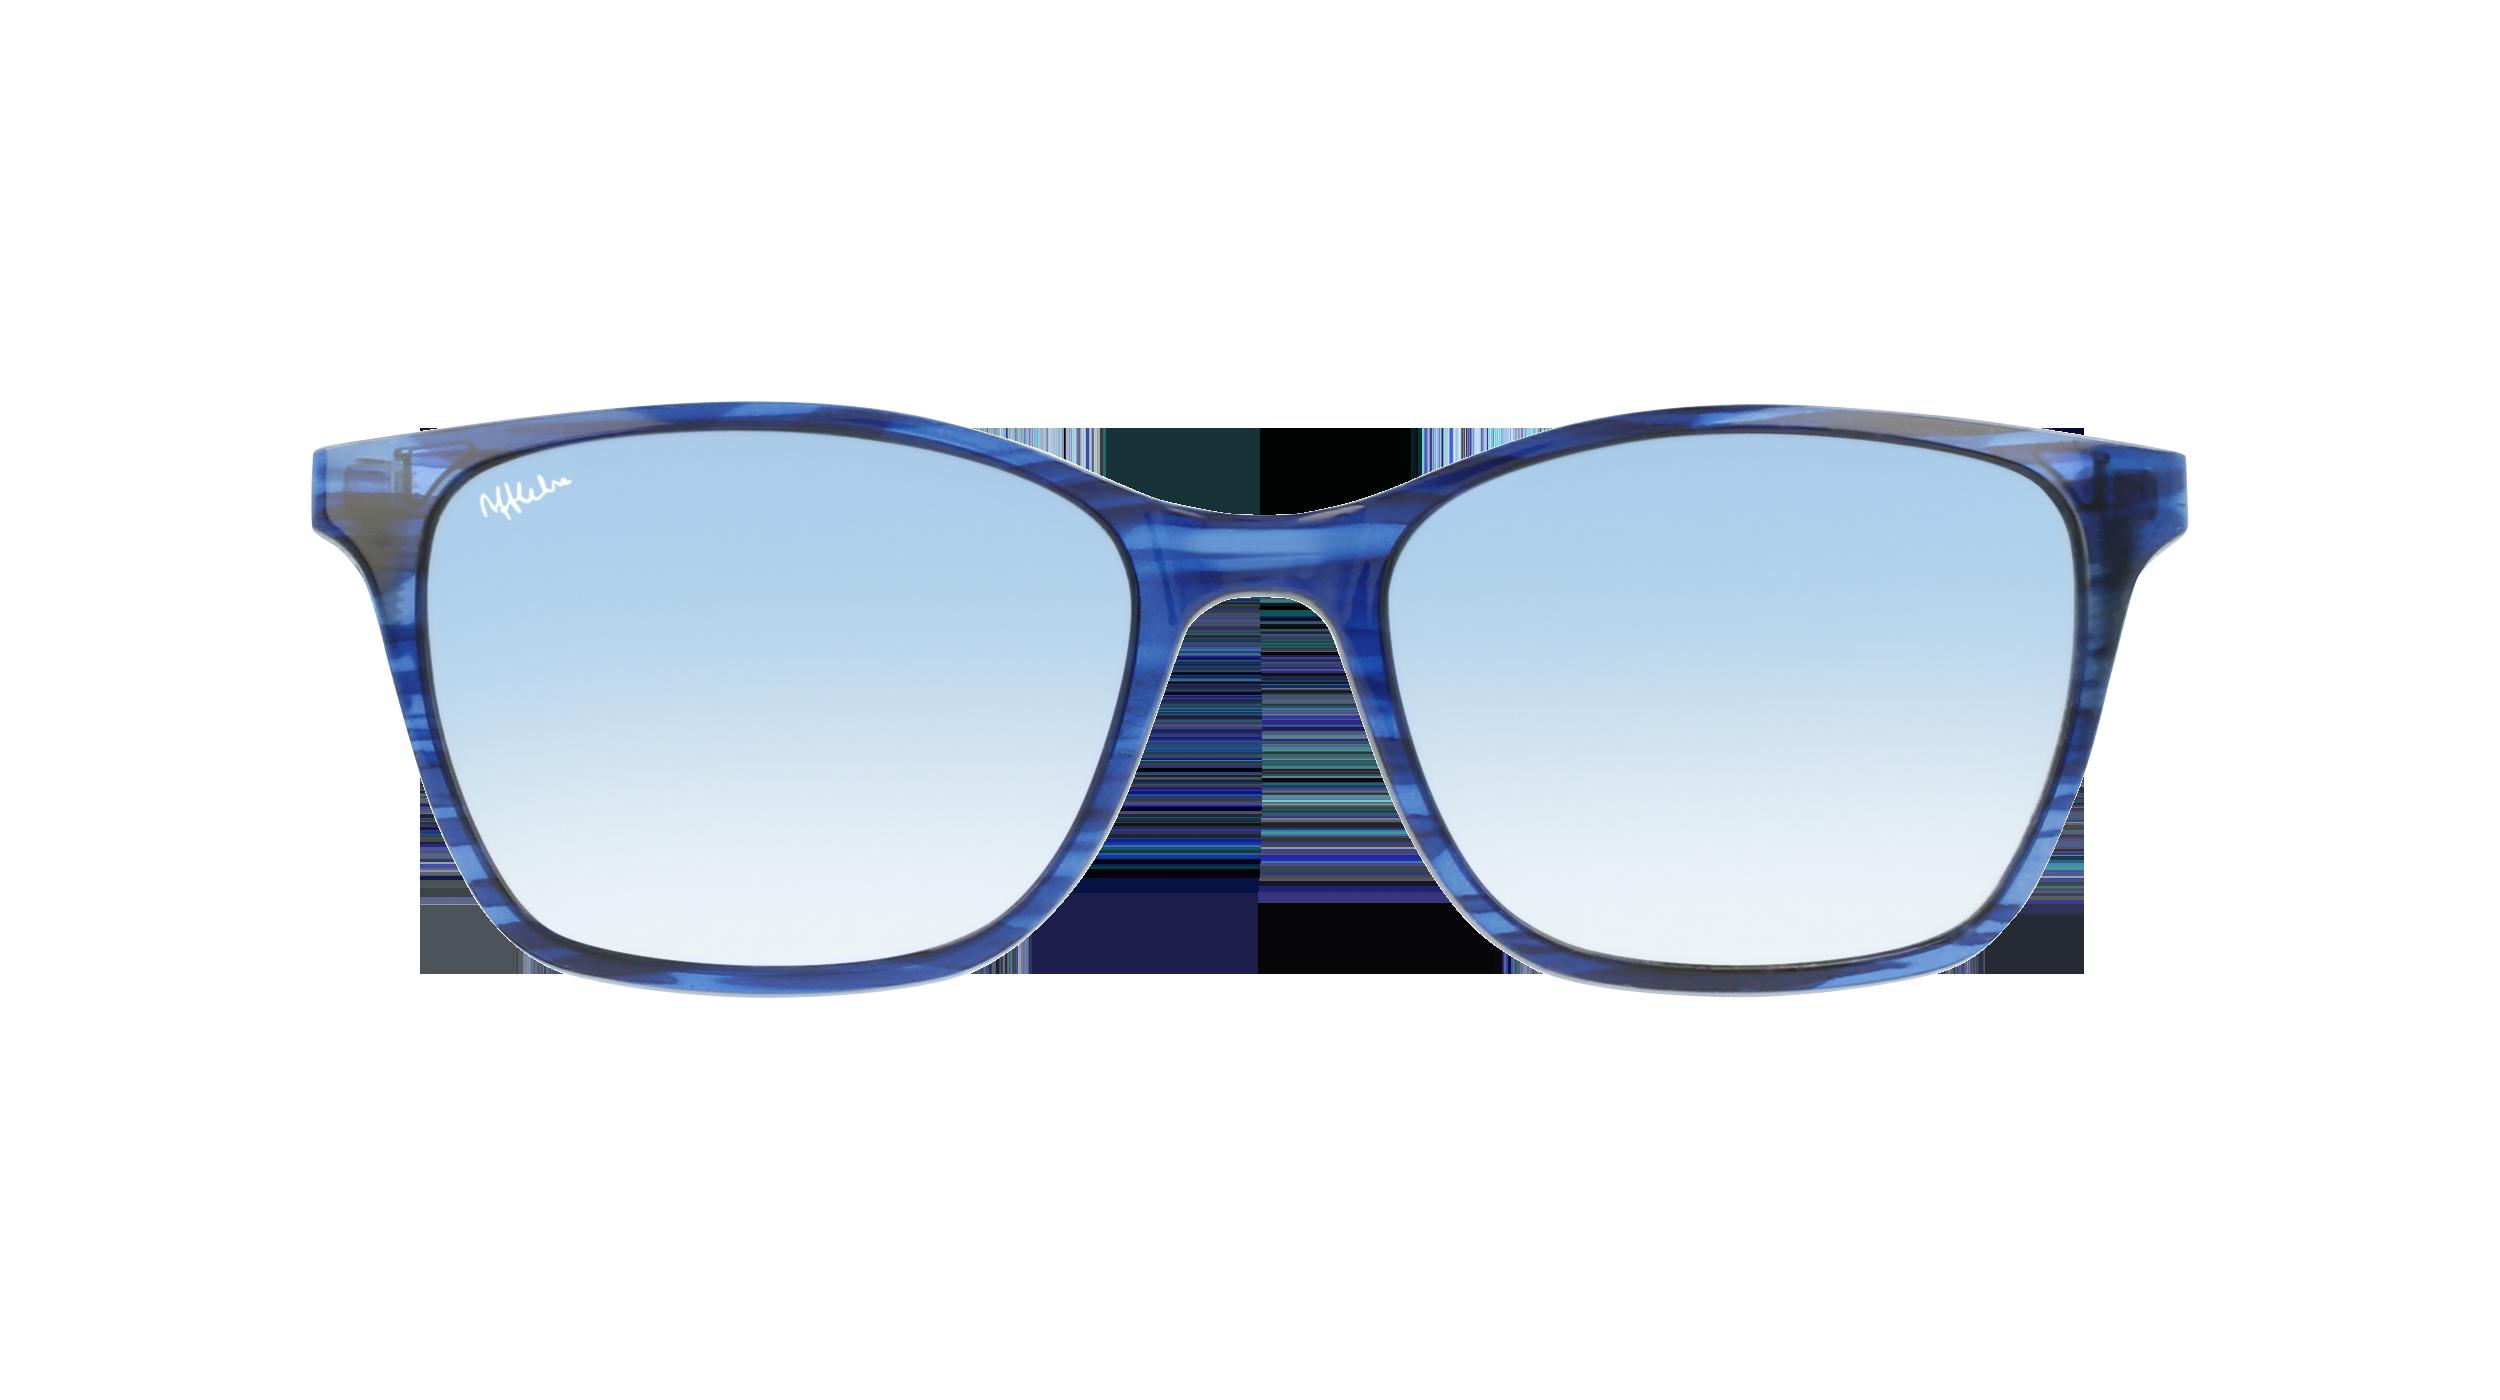 afflelou/france/products/smart_clip/clips_glasses/07630036457535.png